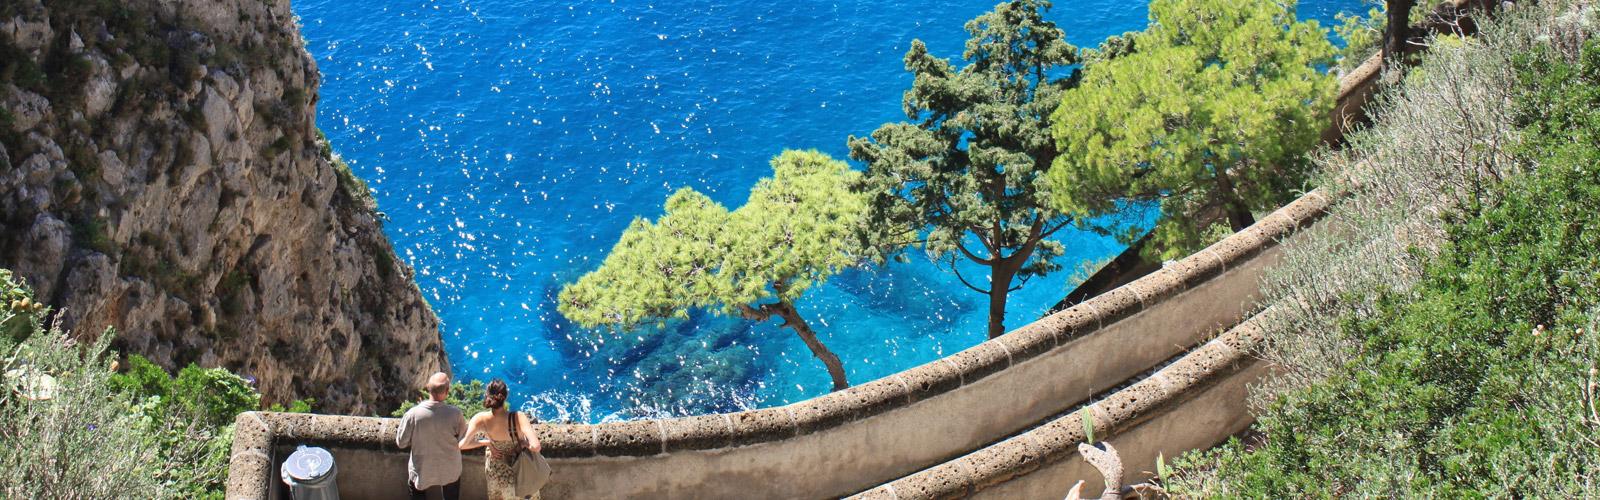 Stunning soggiorno costiera amalfitana photos design for Soggiorno costiera amalfitana